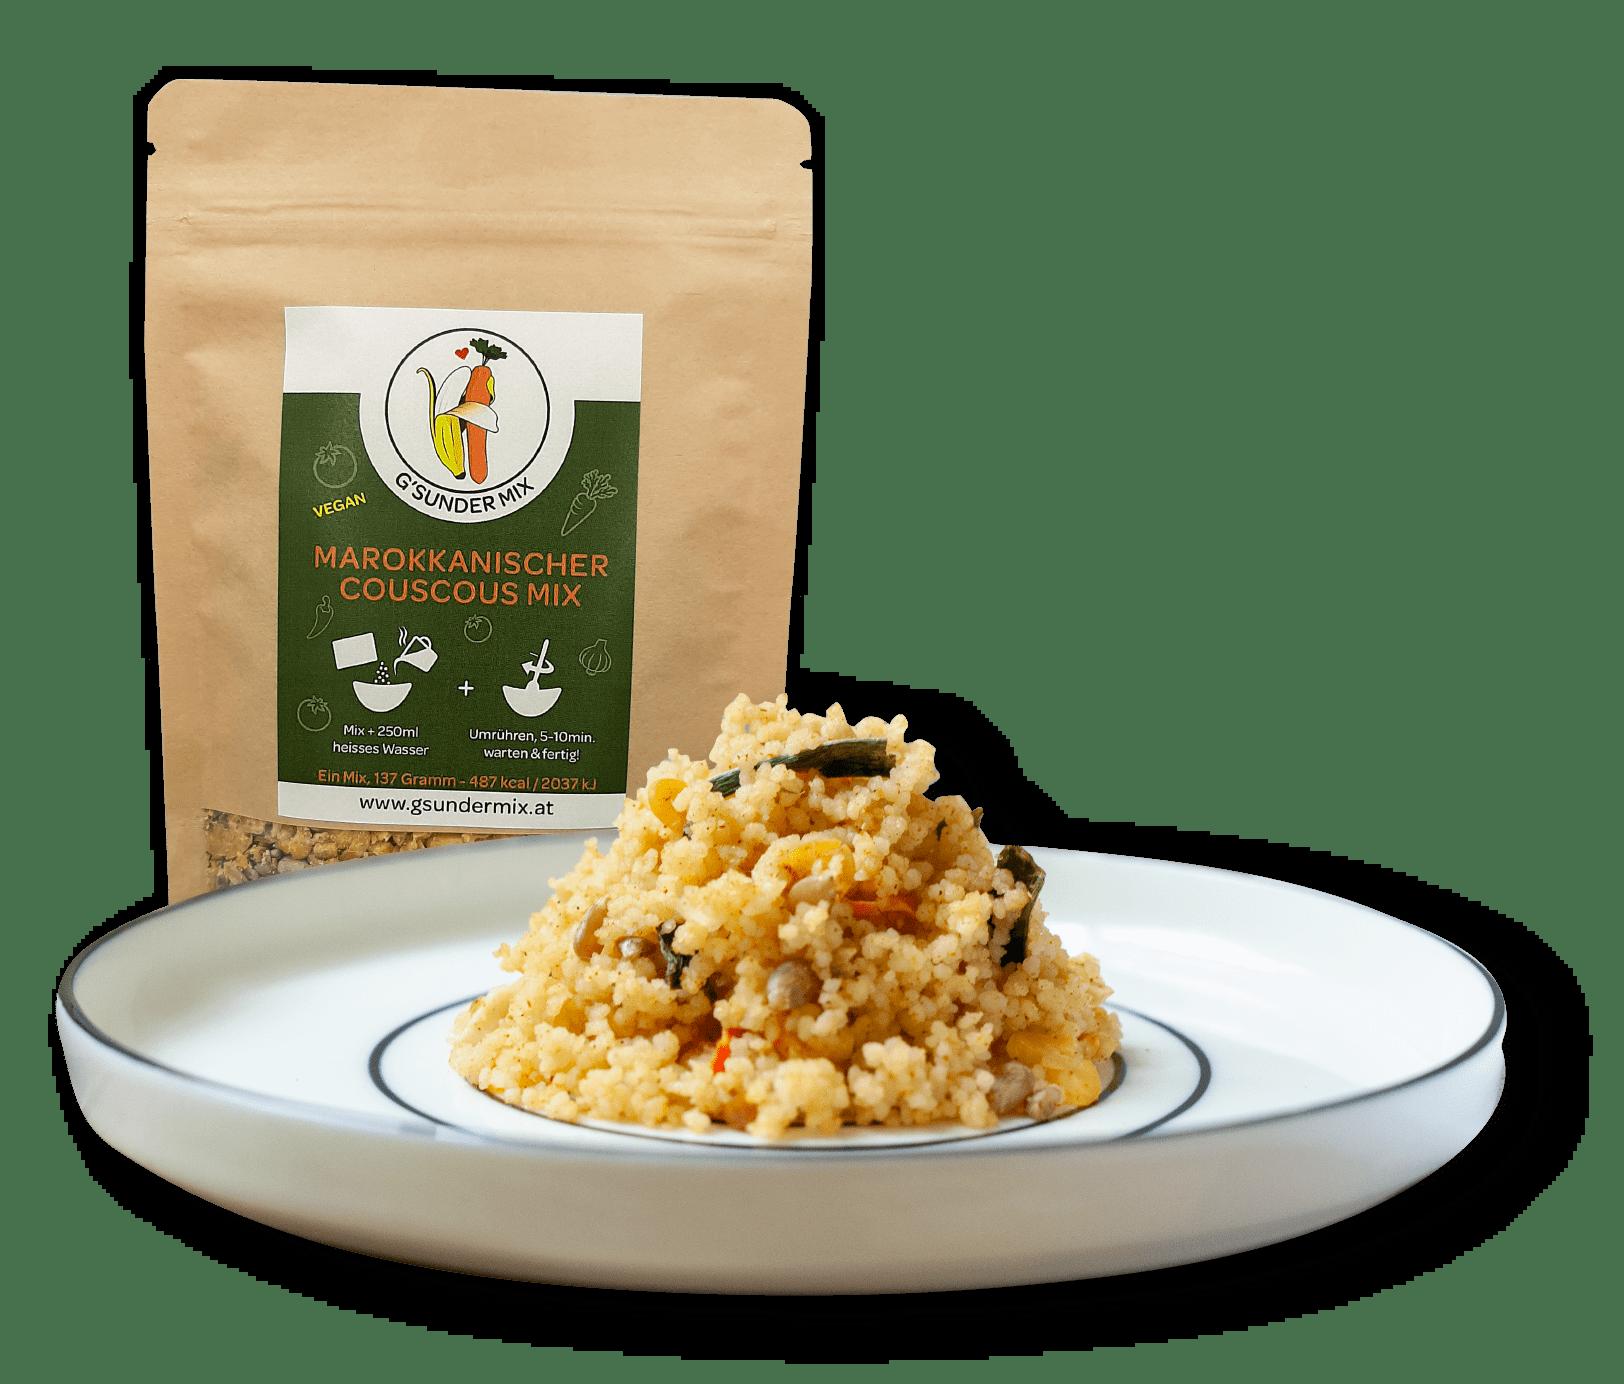 Marrokanischer Couscous Mix auf Teller mit Verpackung dahinter